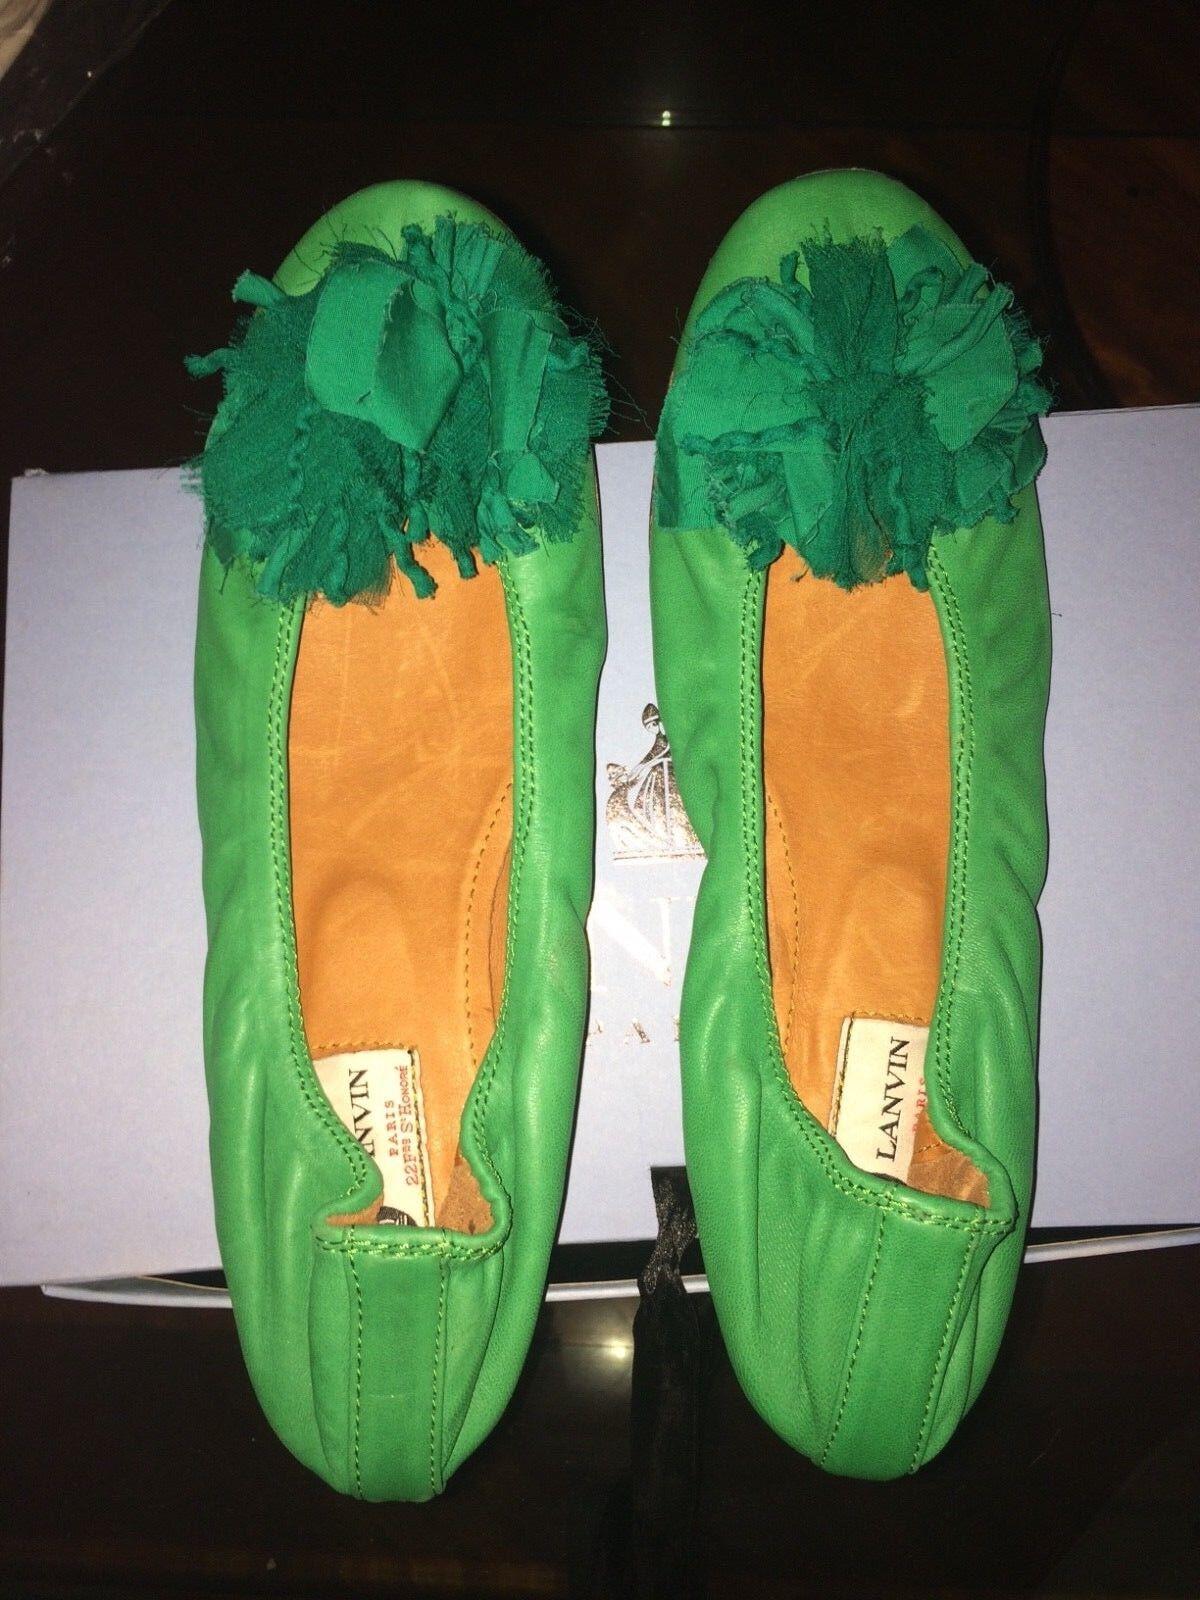 LANVIN SUPER SOFT LEATHER VIVID VIVID VIVID GREEN WEDGED FAMOUS BALLERINA FLATS   AMAZING 2f8a57